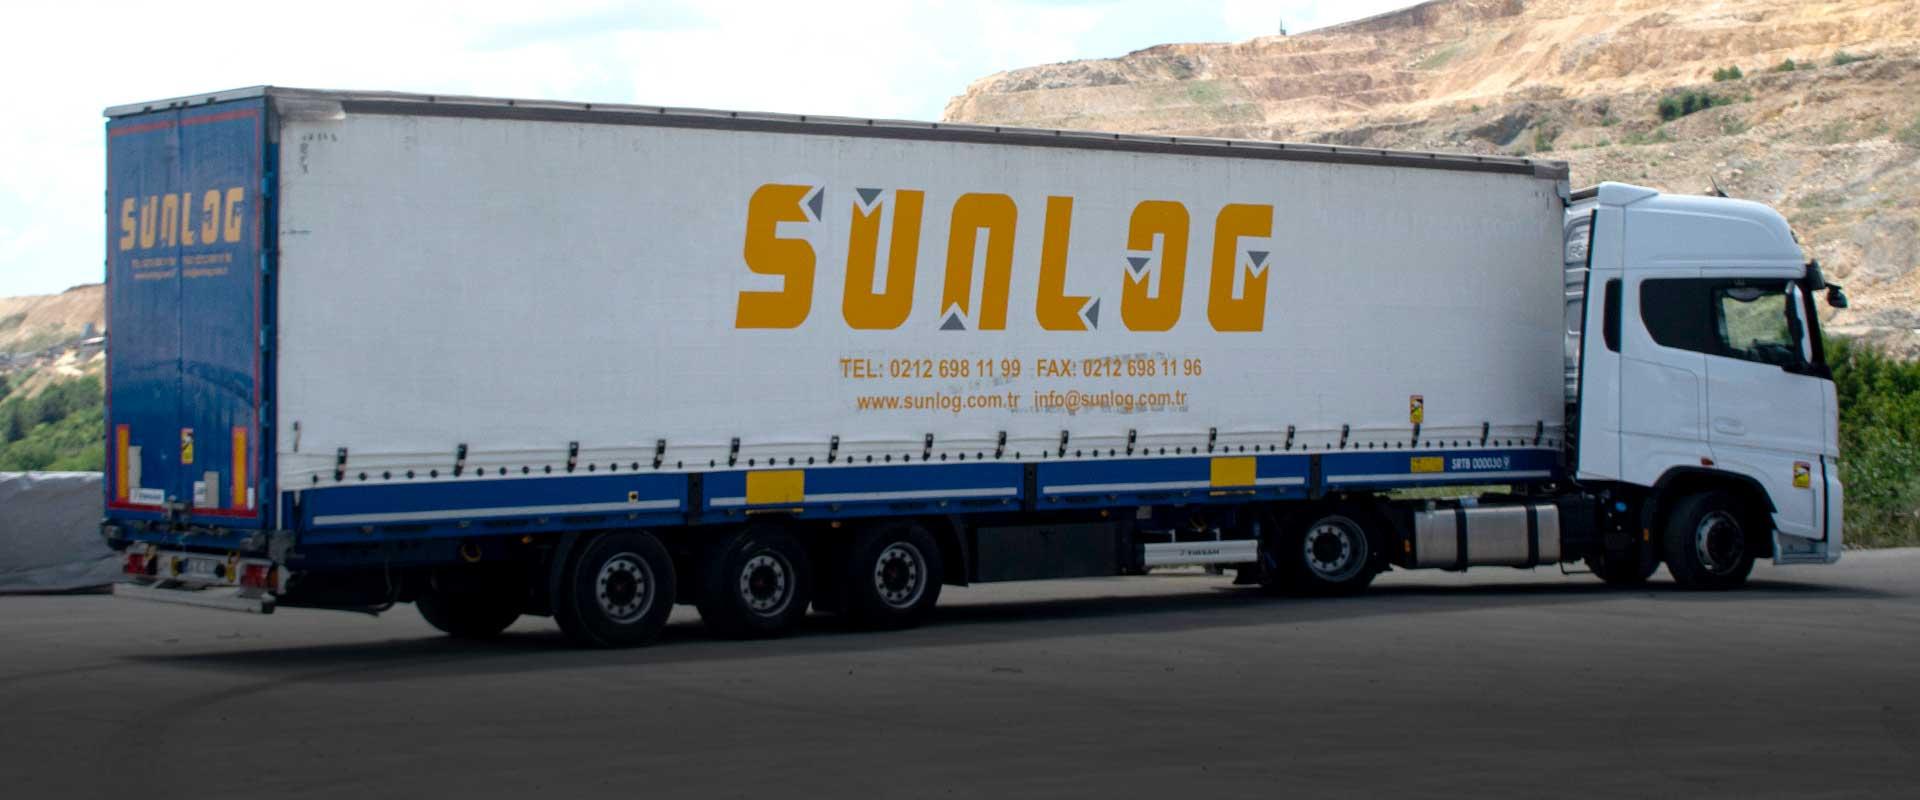 SUNLOG-WEBSITE-A-HOLLANDA